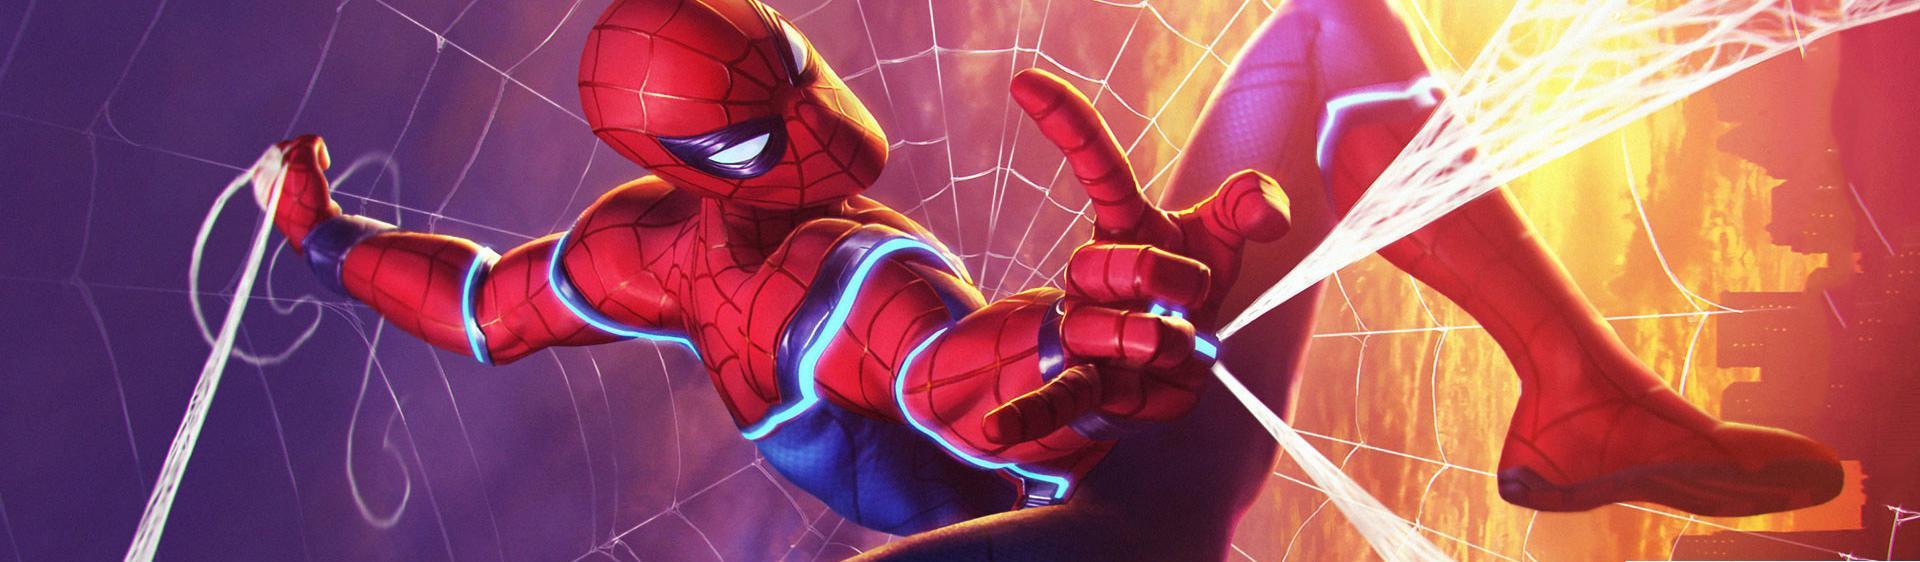 Wallpaper Spiderman